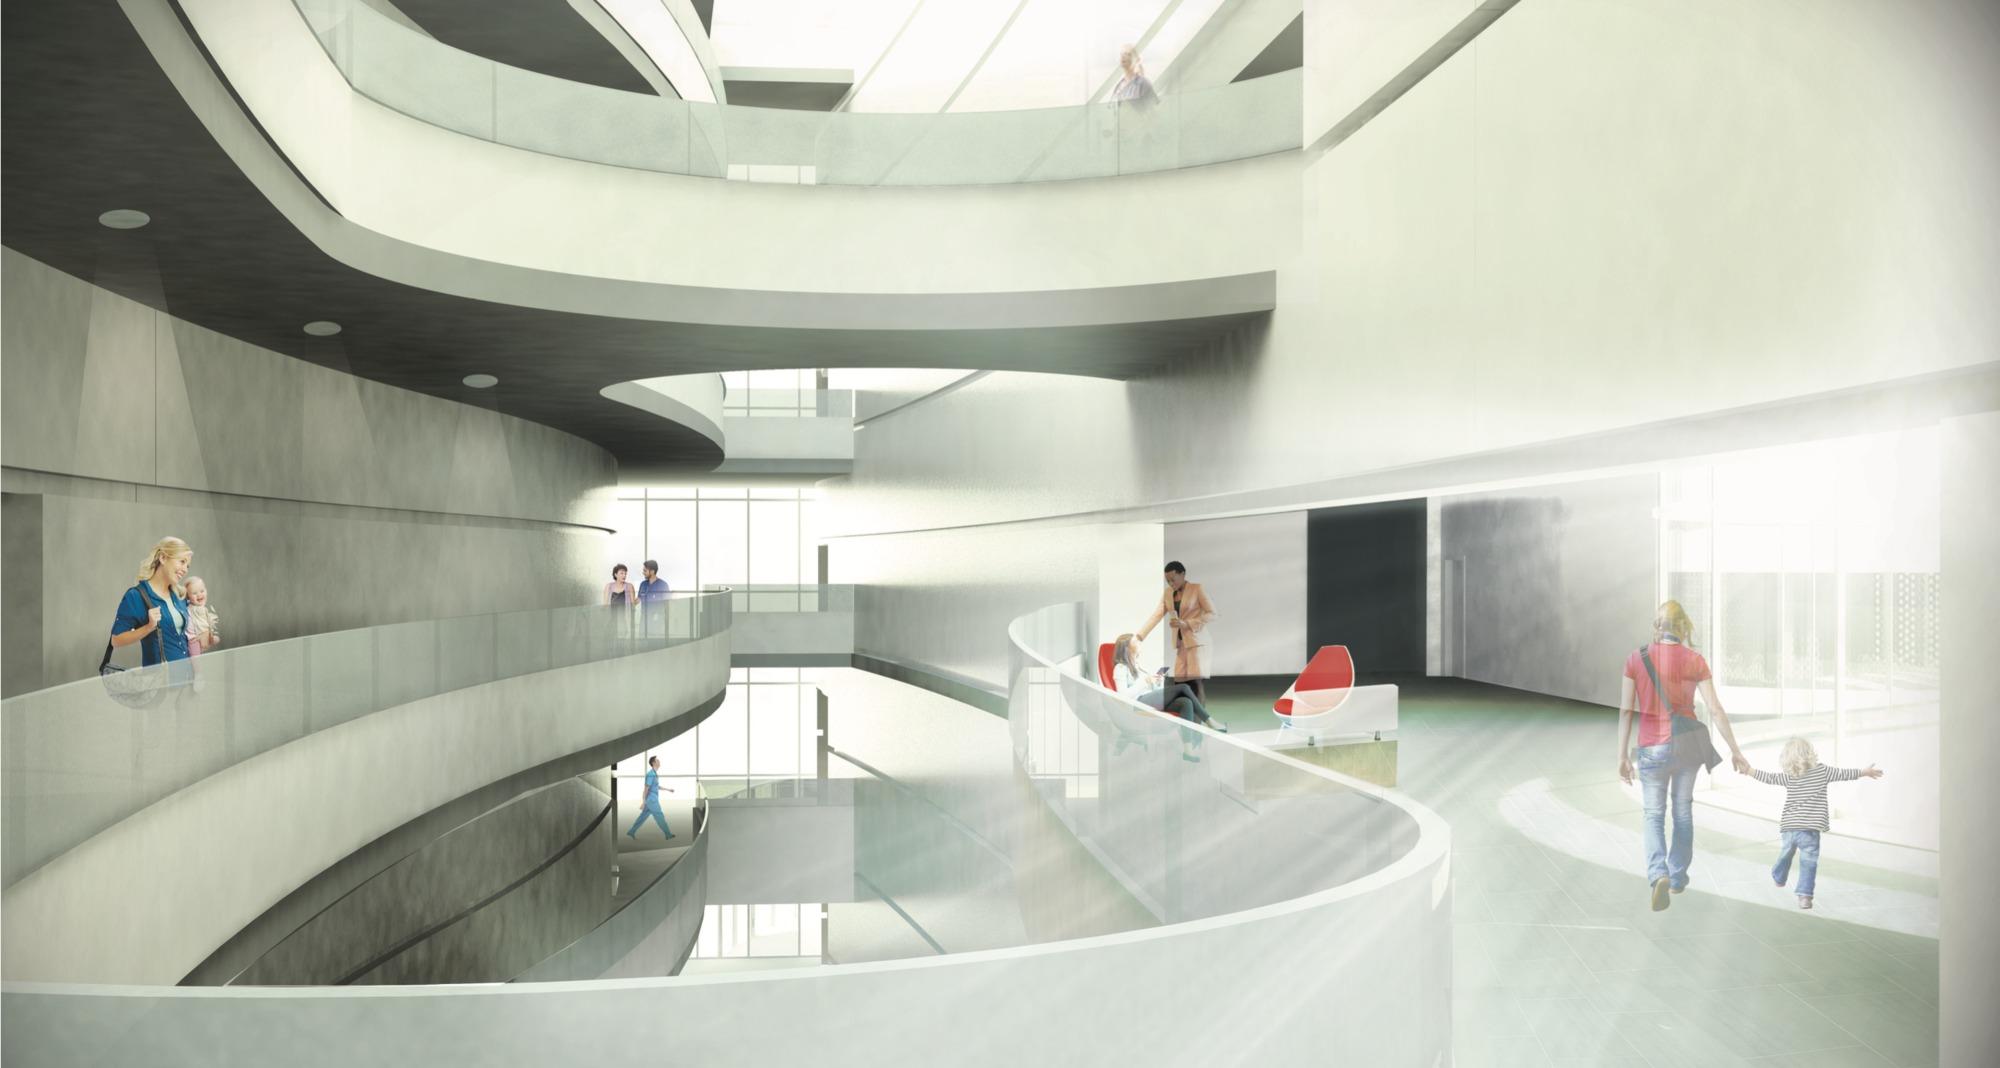 Munroe meyer institute atrium rendering design melissa hywood image courtesy of college